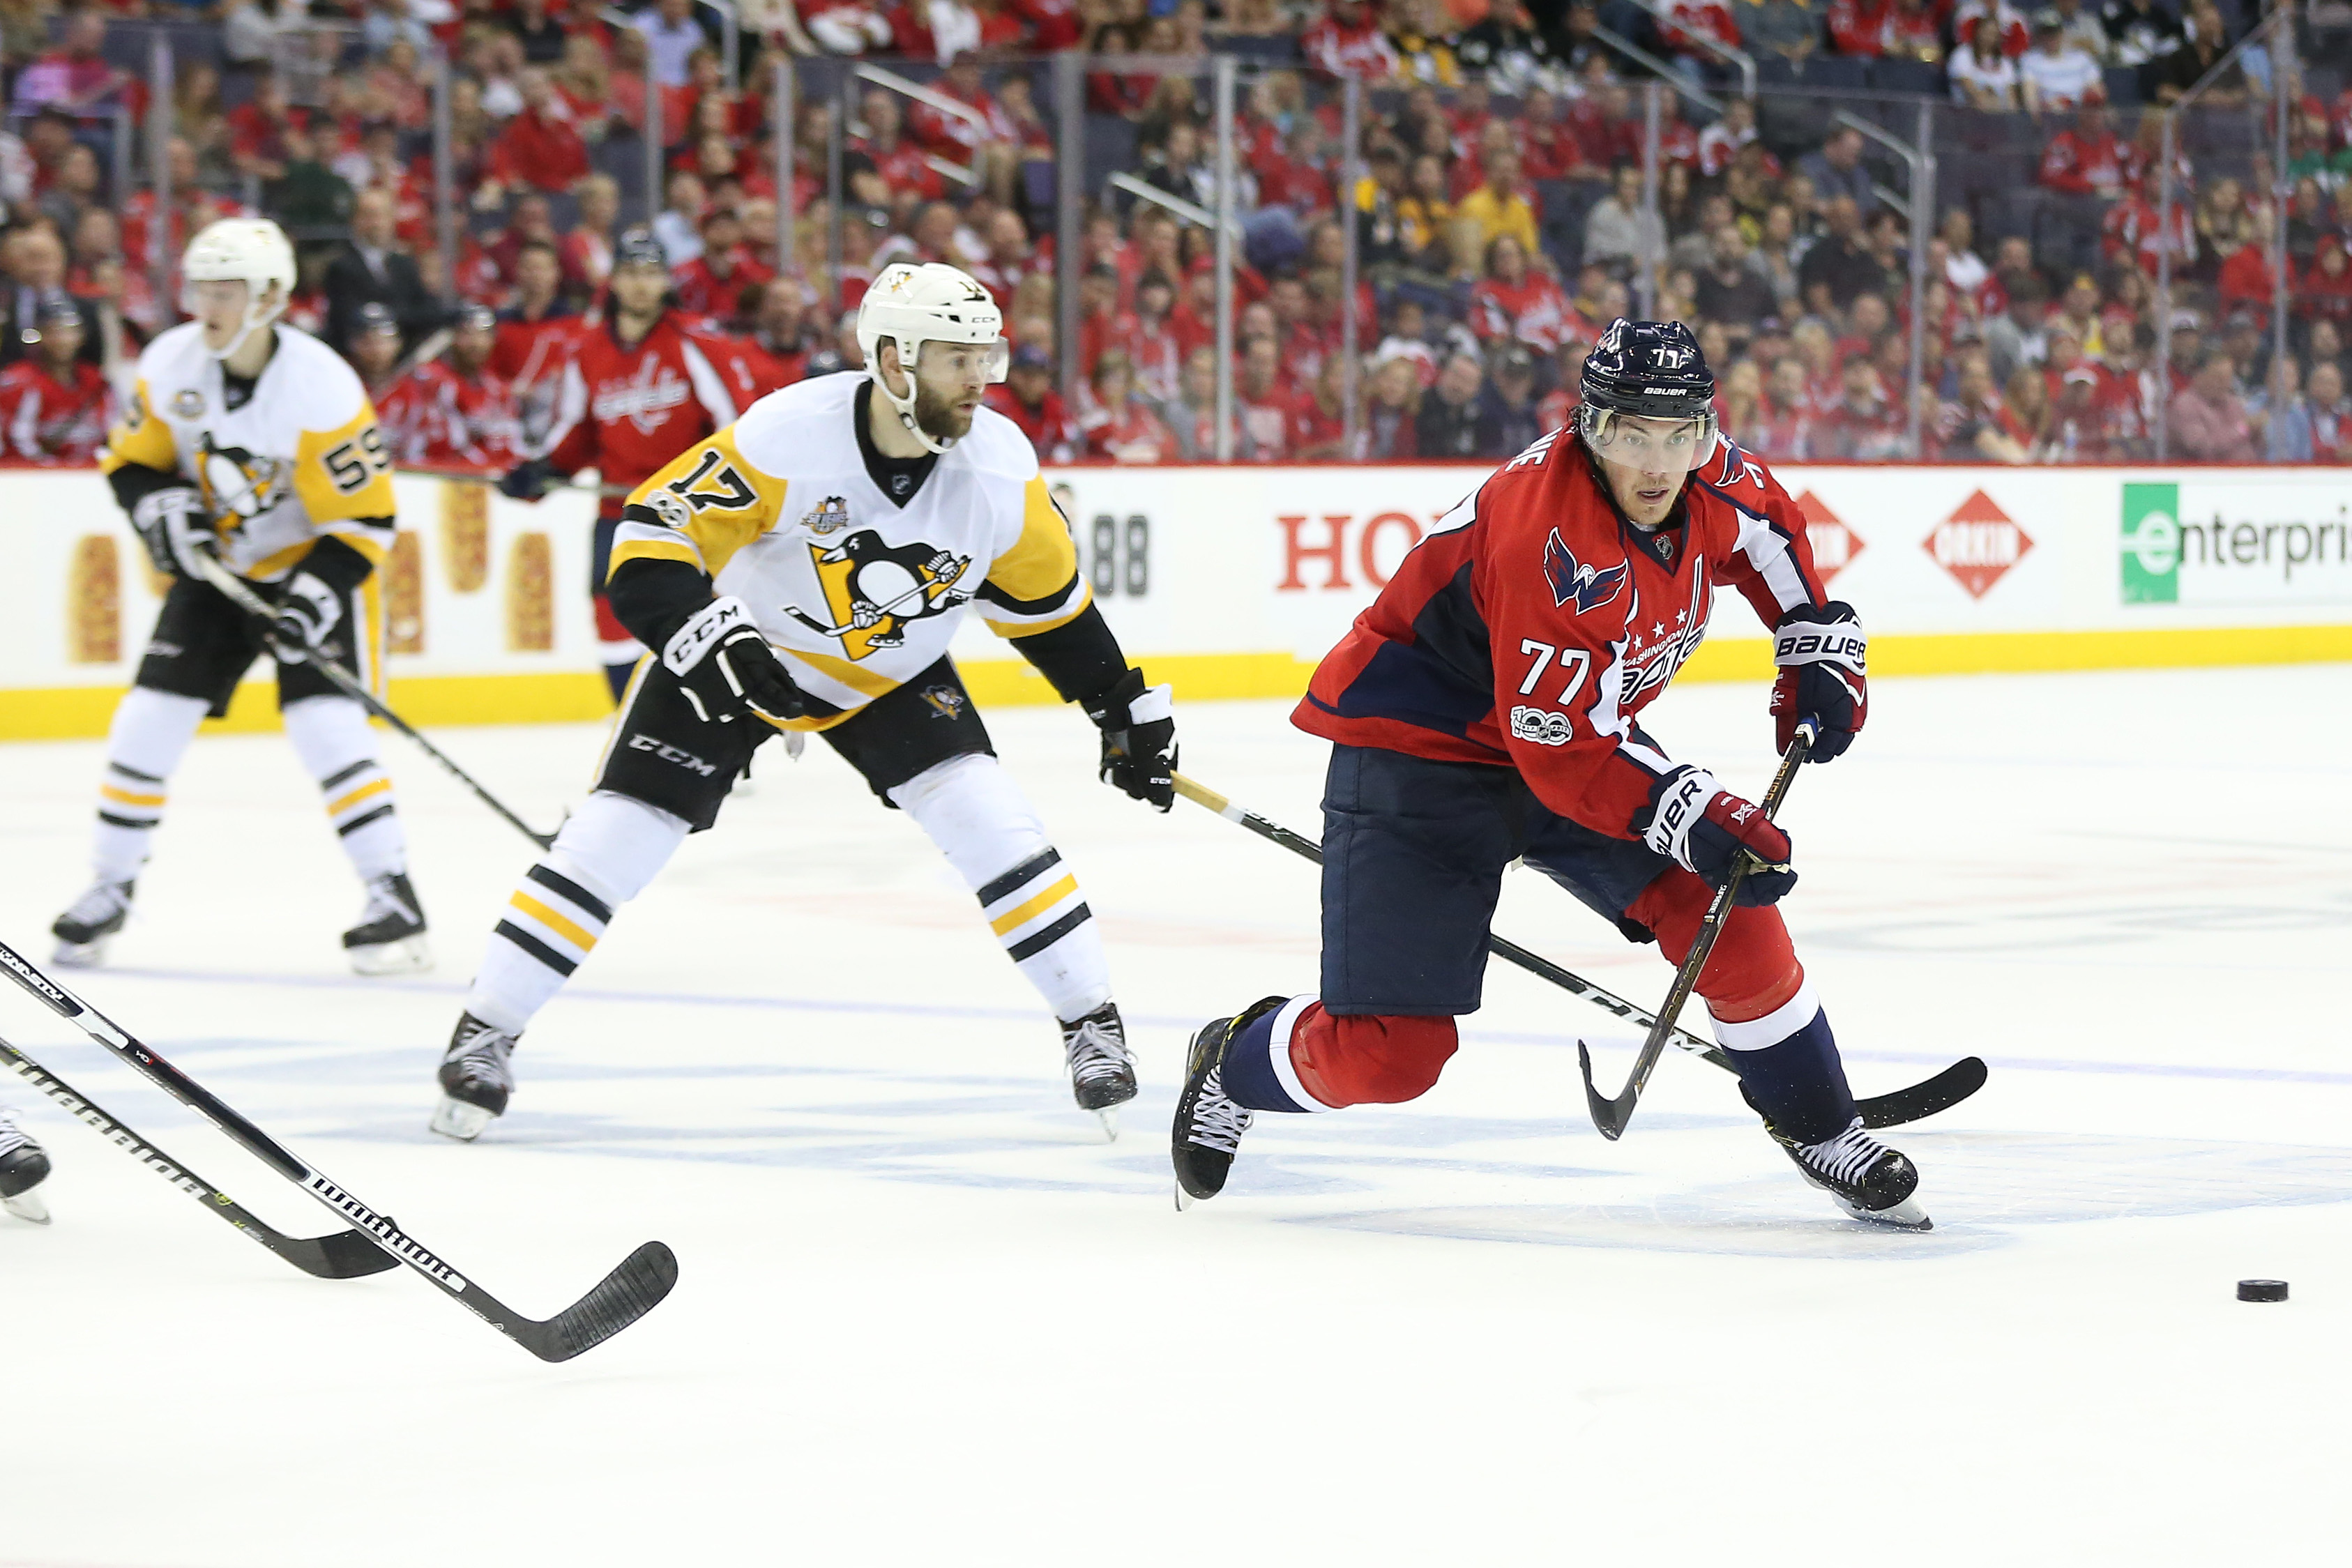 penguins hockey radio 105.9